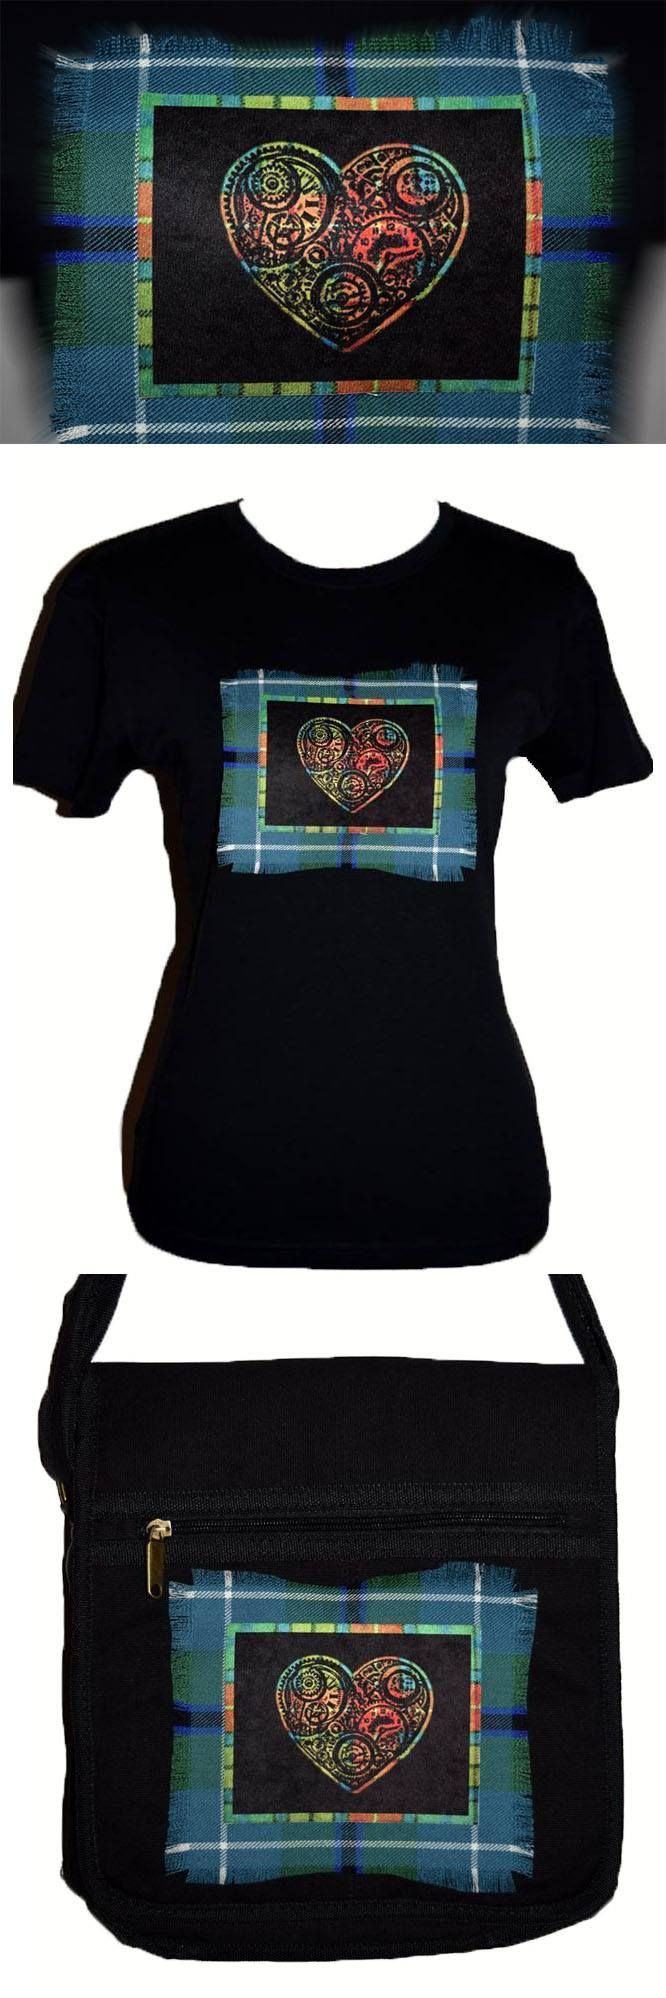 Best 25+ Custom made shirts ideas only on Pinterest | Kylie jenner ...